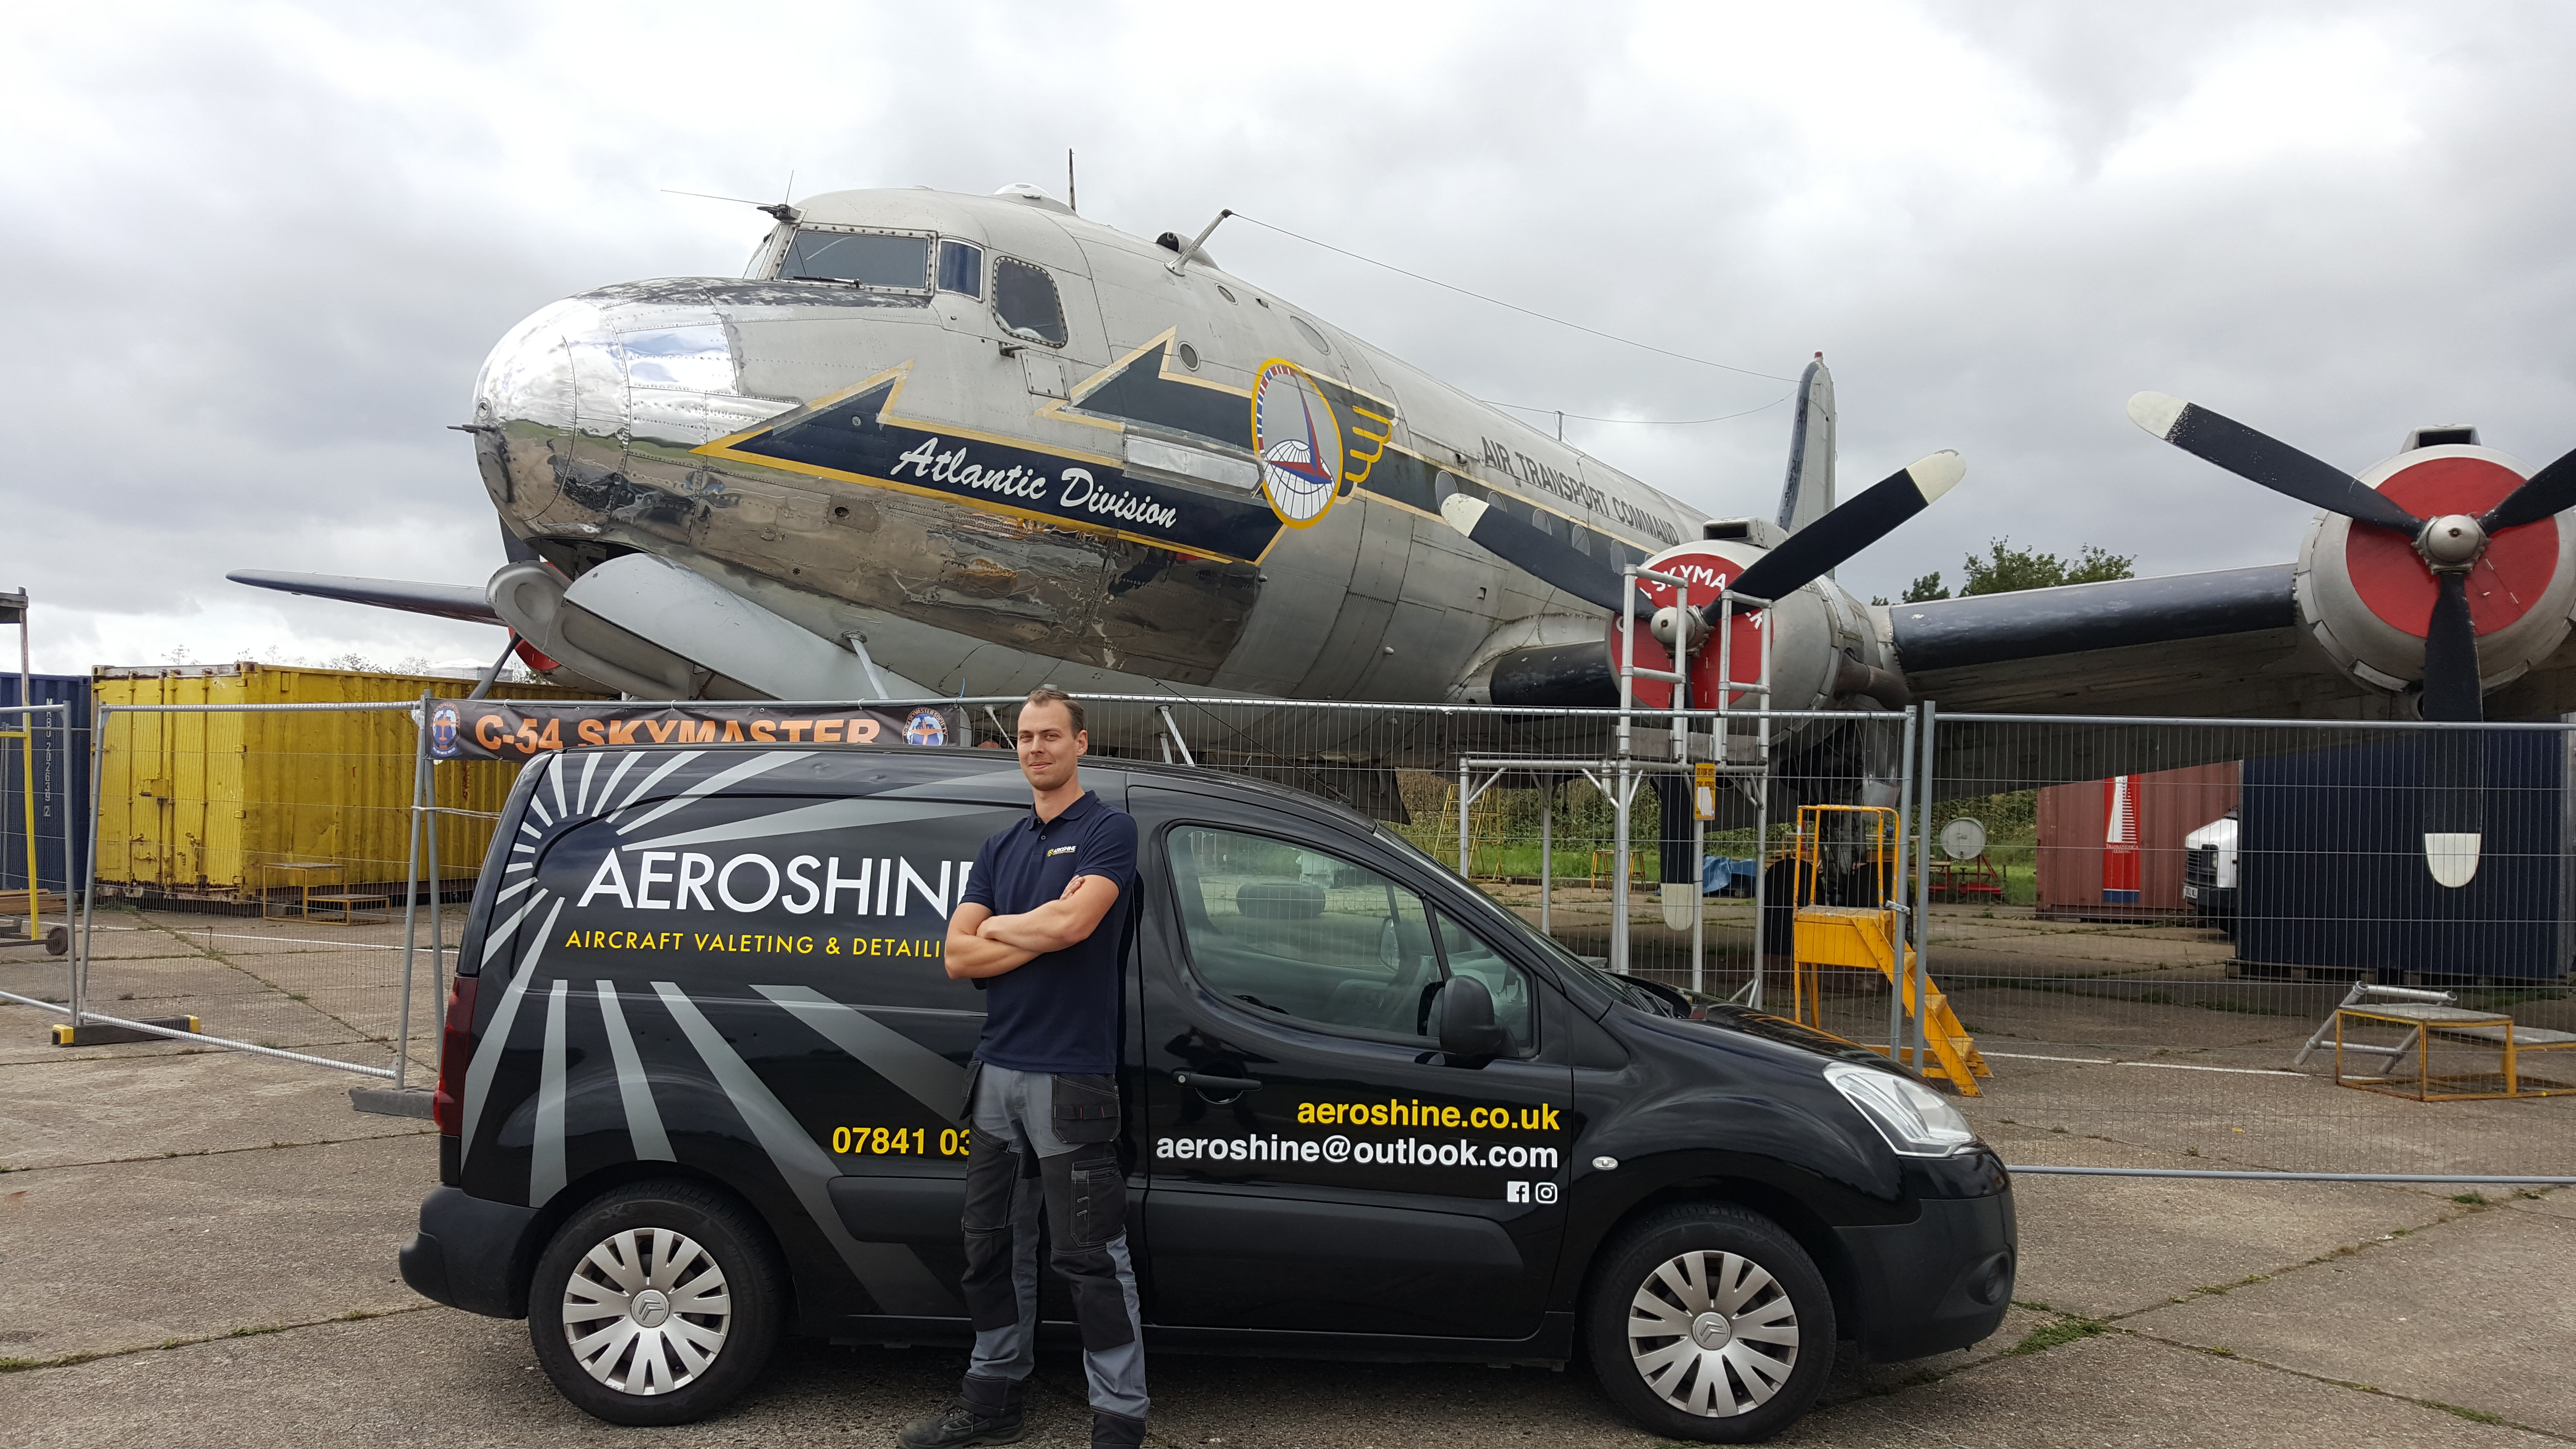 Aeroshine sponsor